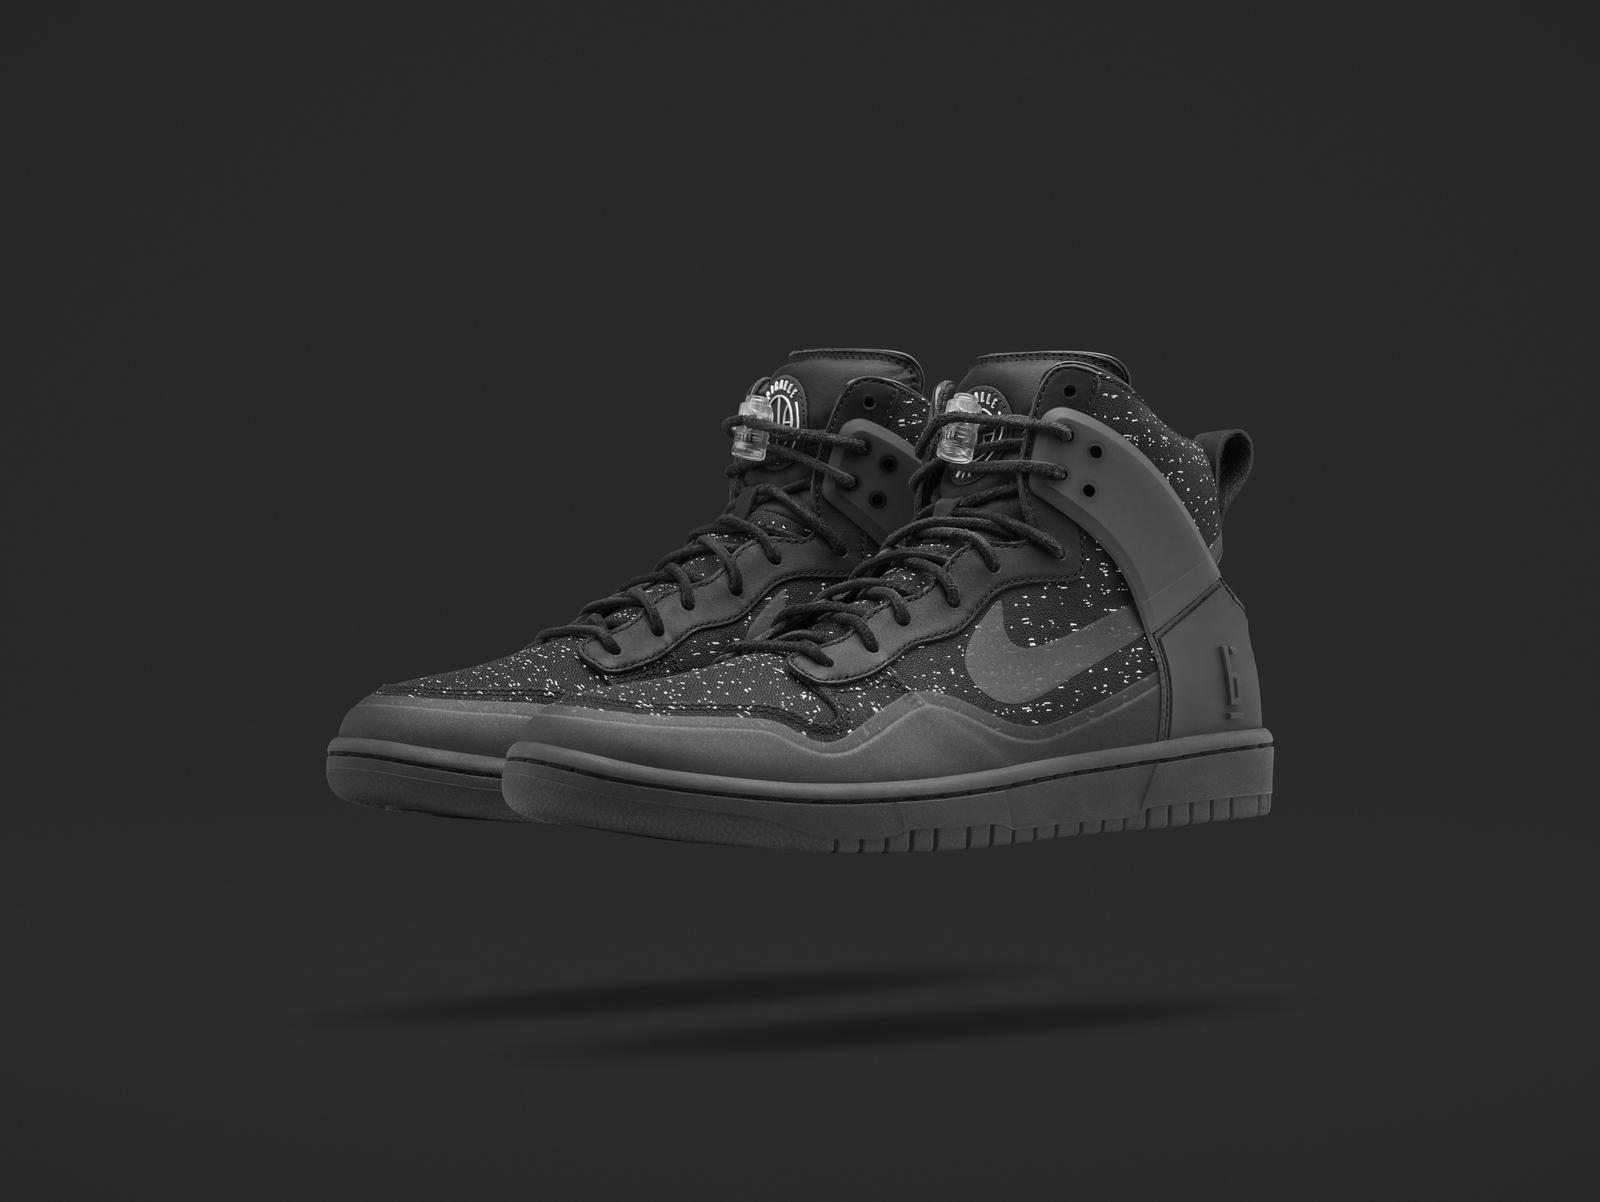 NikeLab x Pigalle Dunk